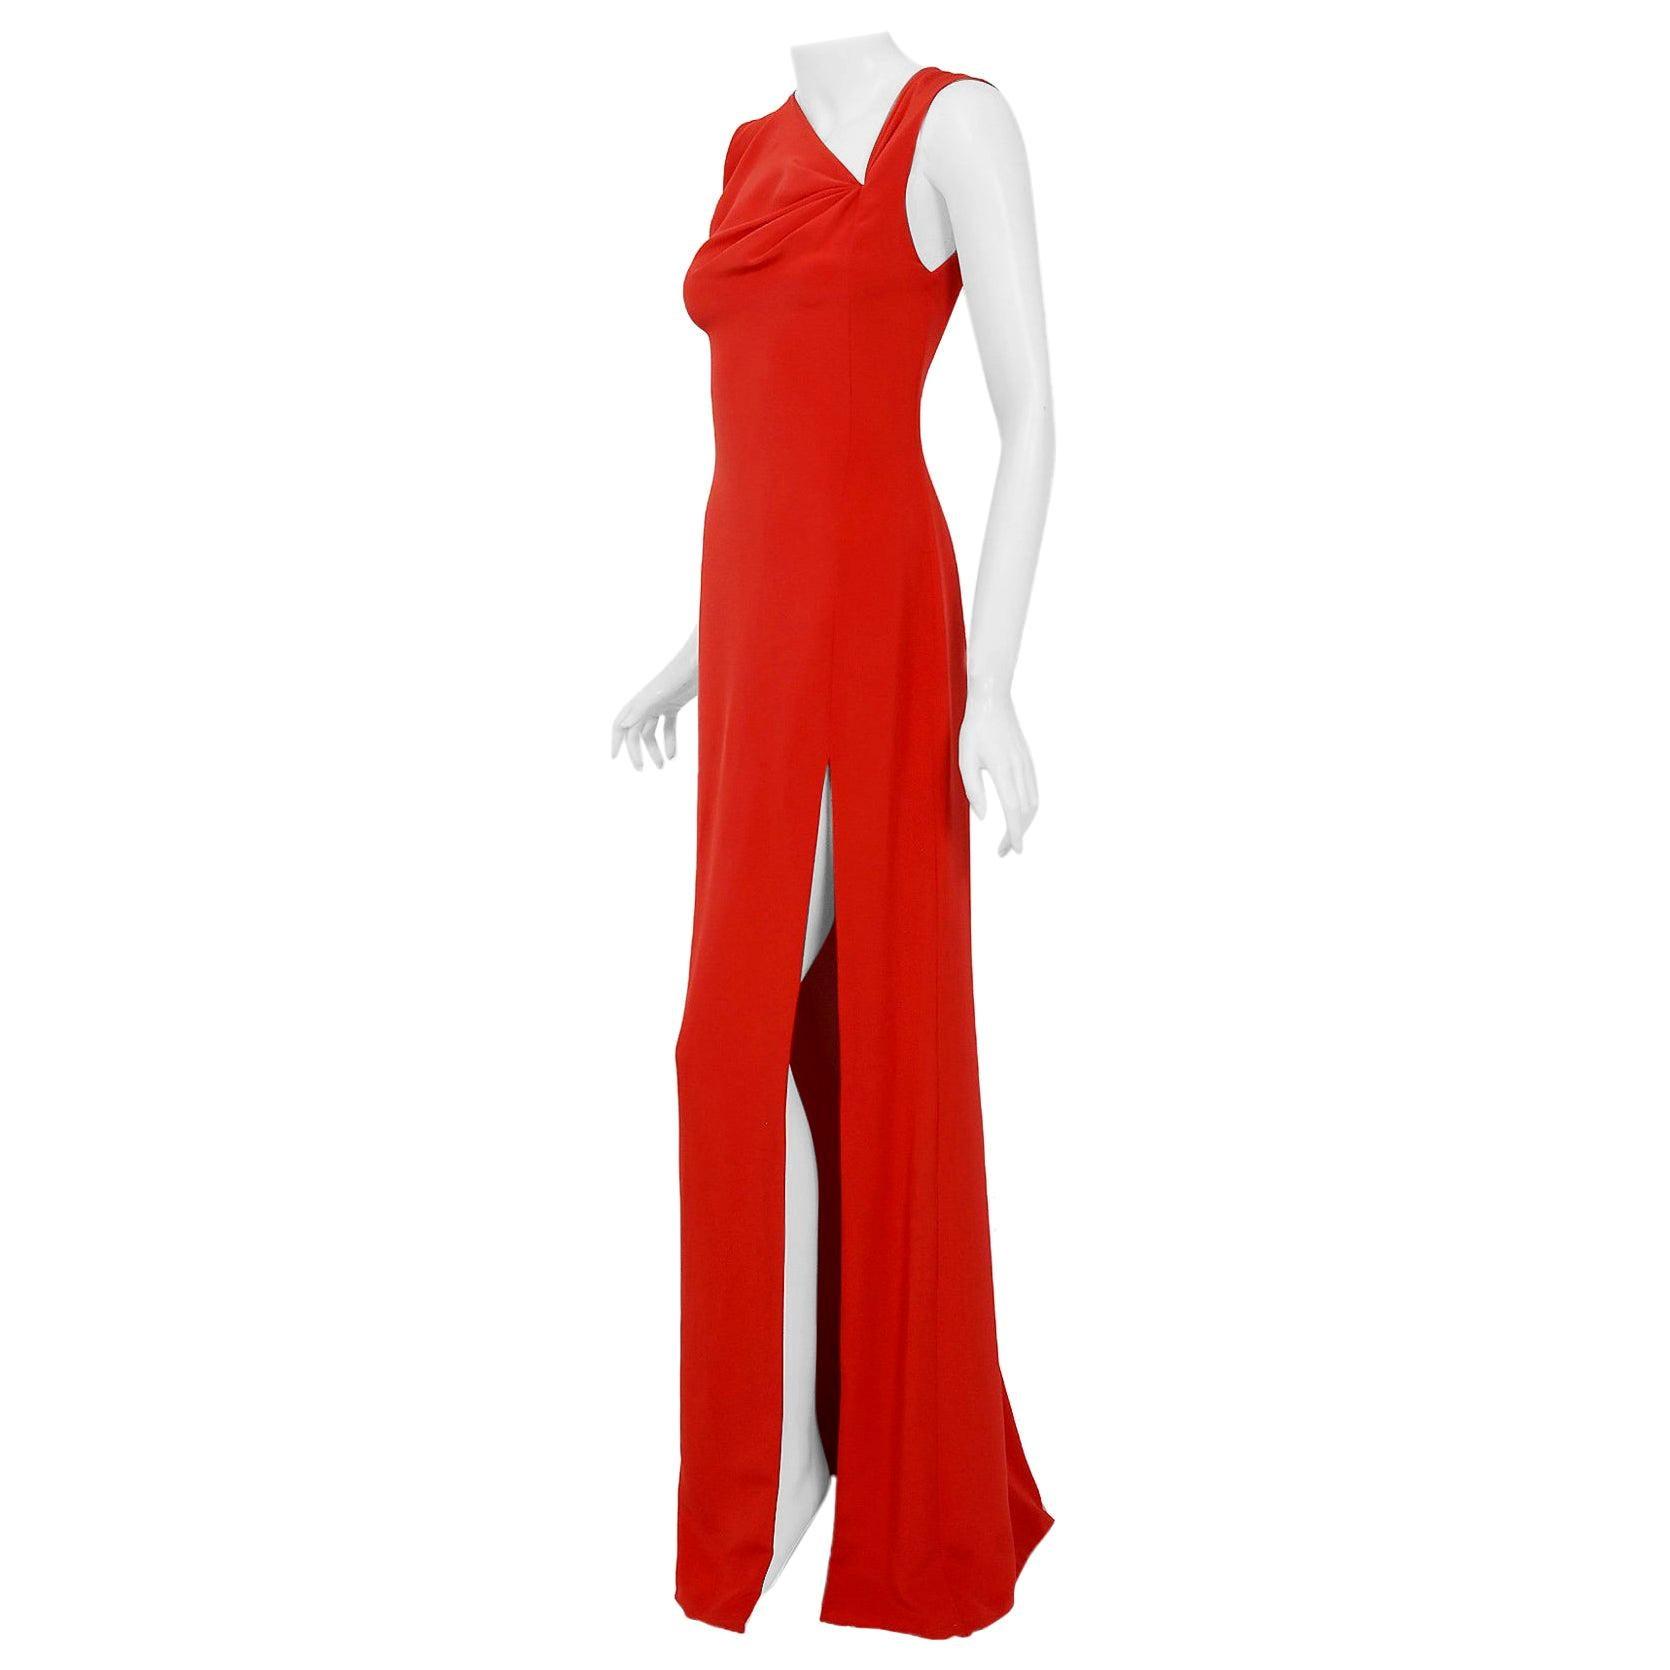 Vintage 1990 Bill Blass Poppy Red Silk Asymmetric Bias-Cut High Slit Gown w/Tags